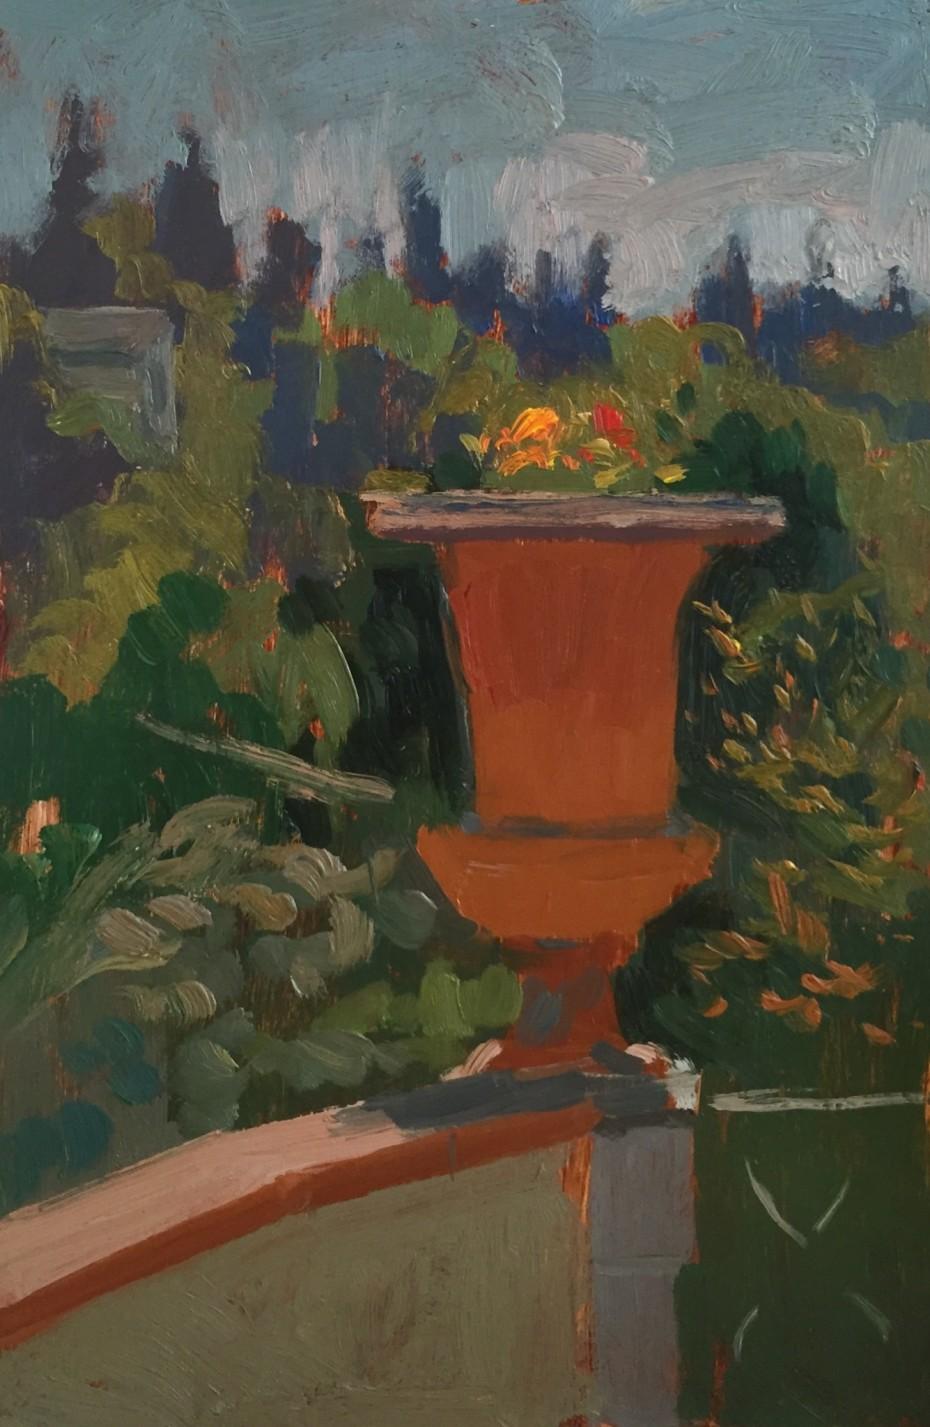 Morning Light on the Flower Pot and the Boboli Gardens Beyond